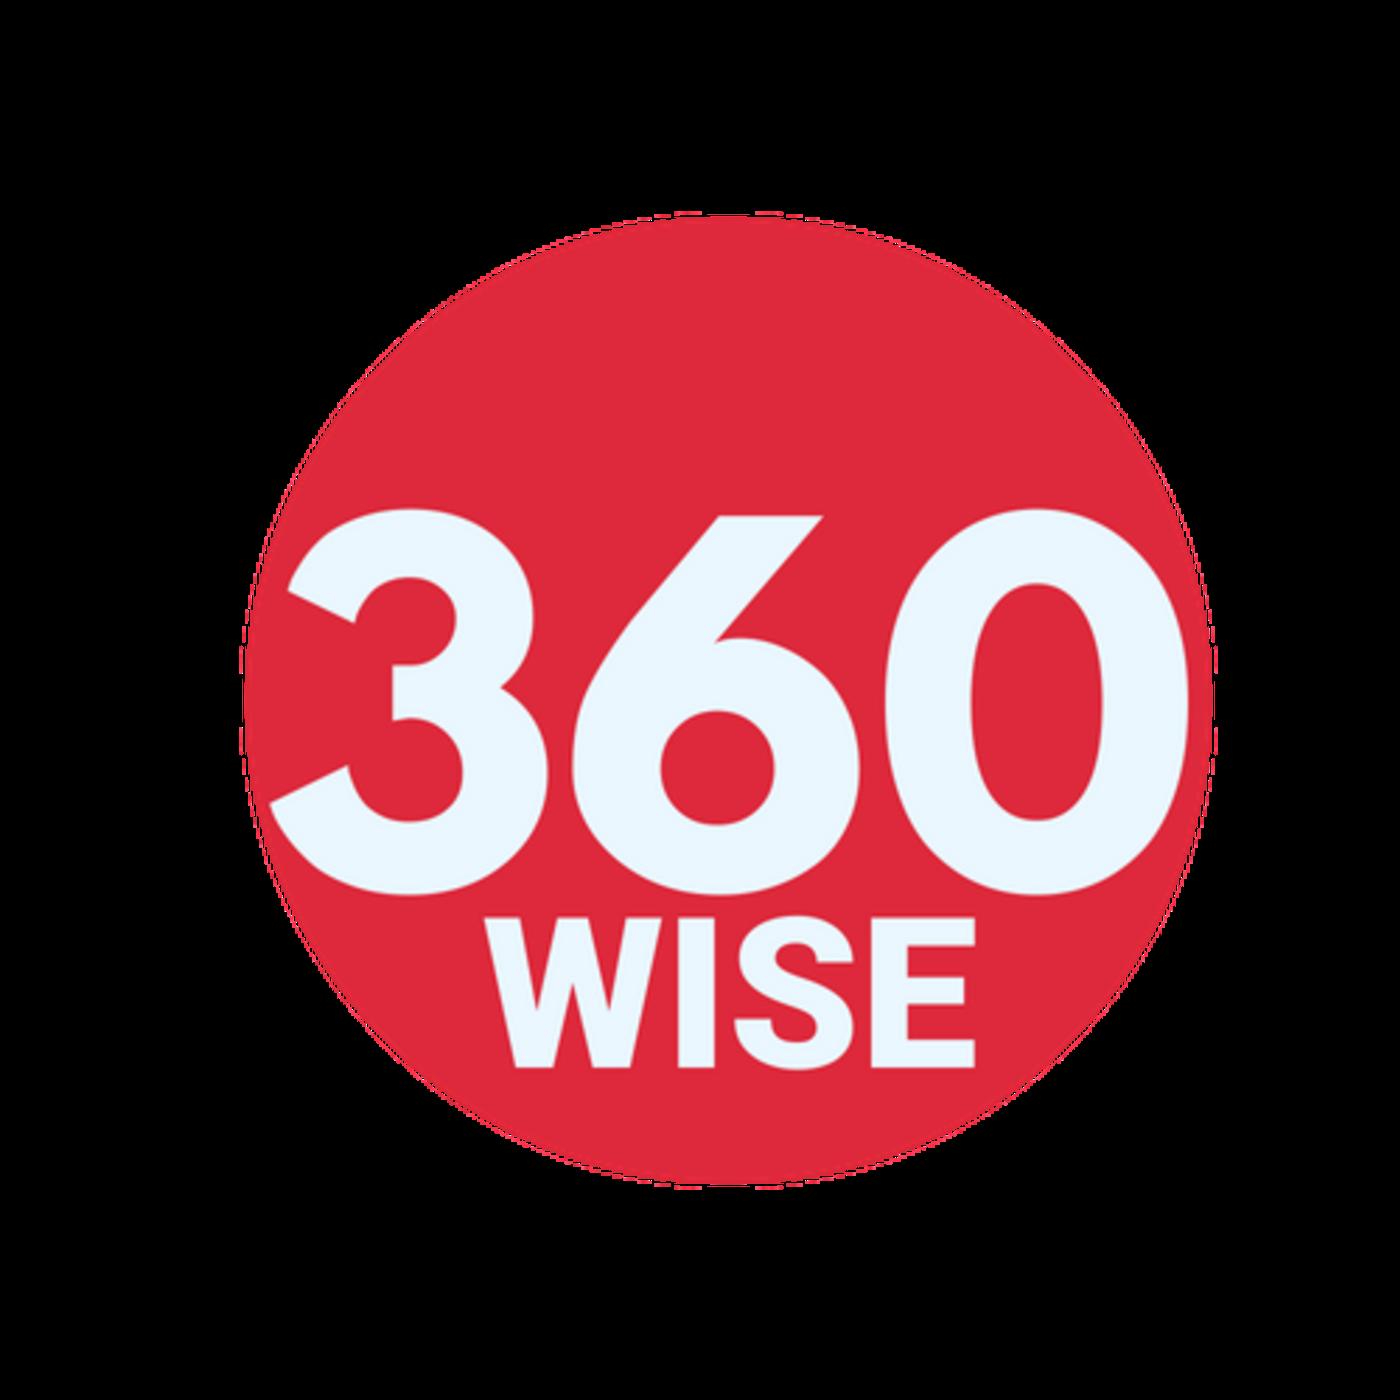 360WiSE Logo